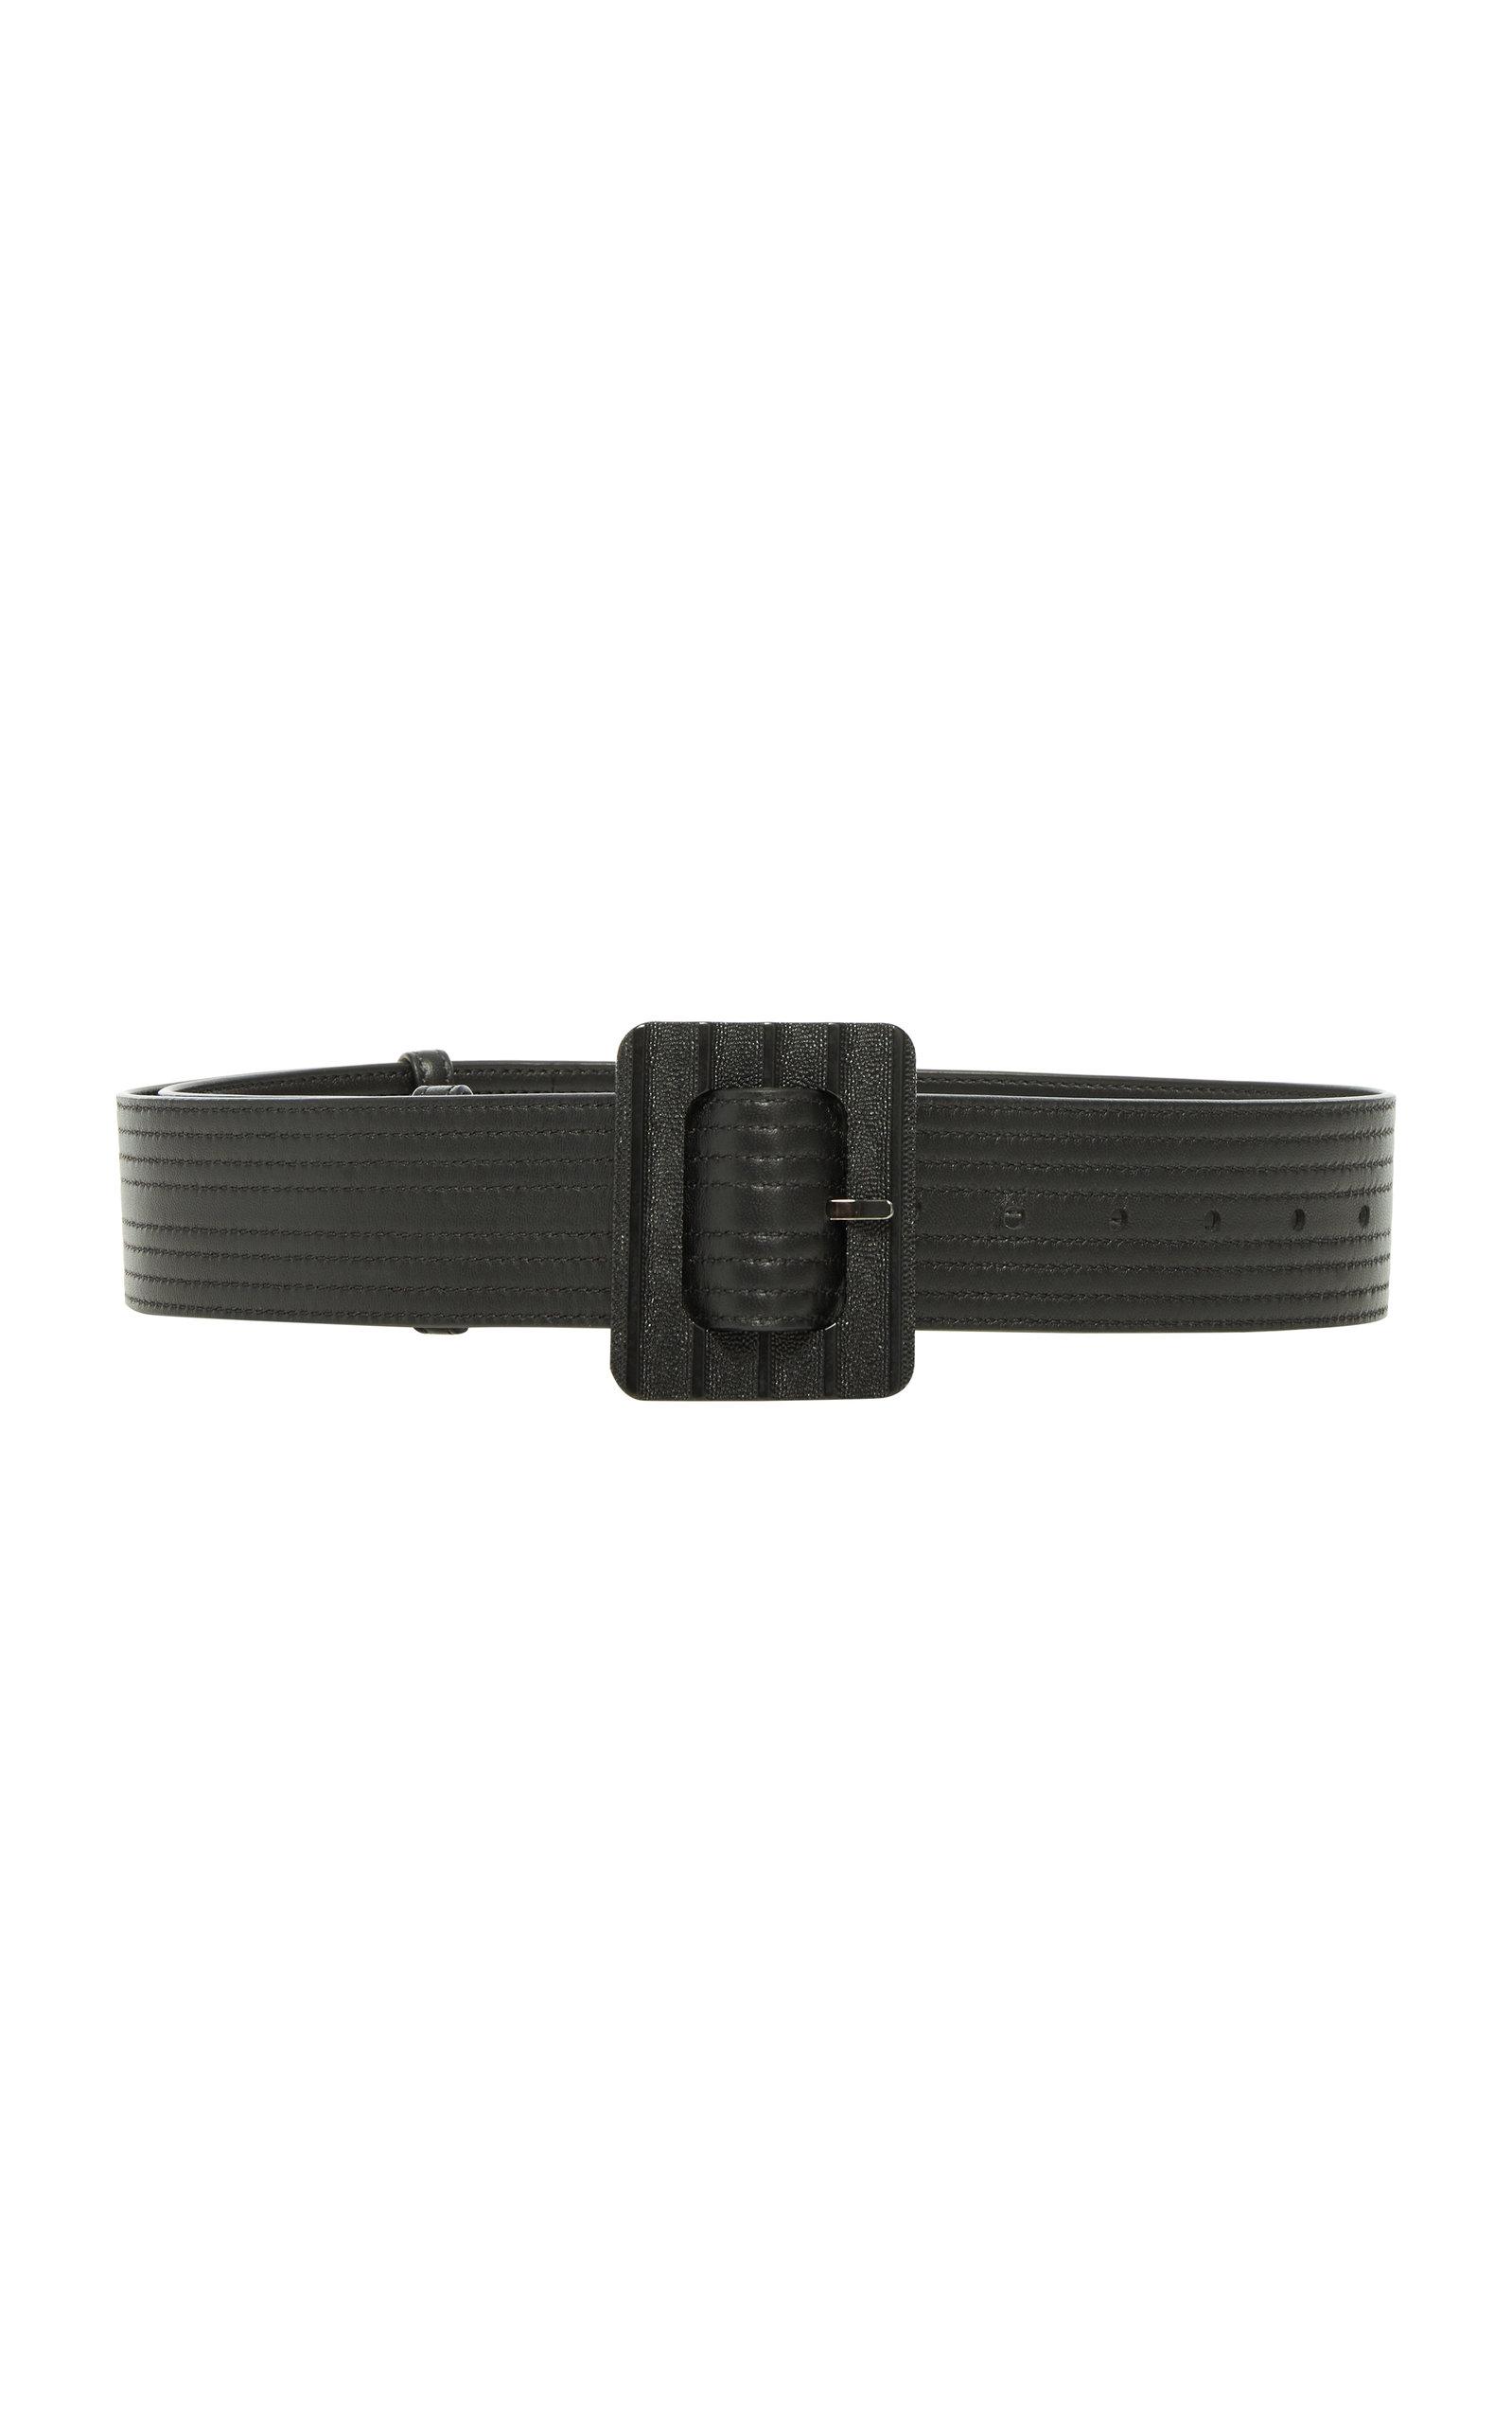 Givenchy Belts Stitched Leather Waist Belt